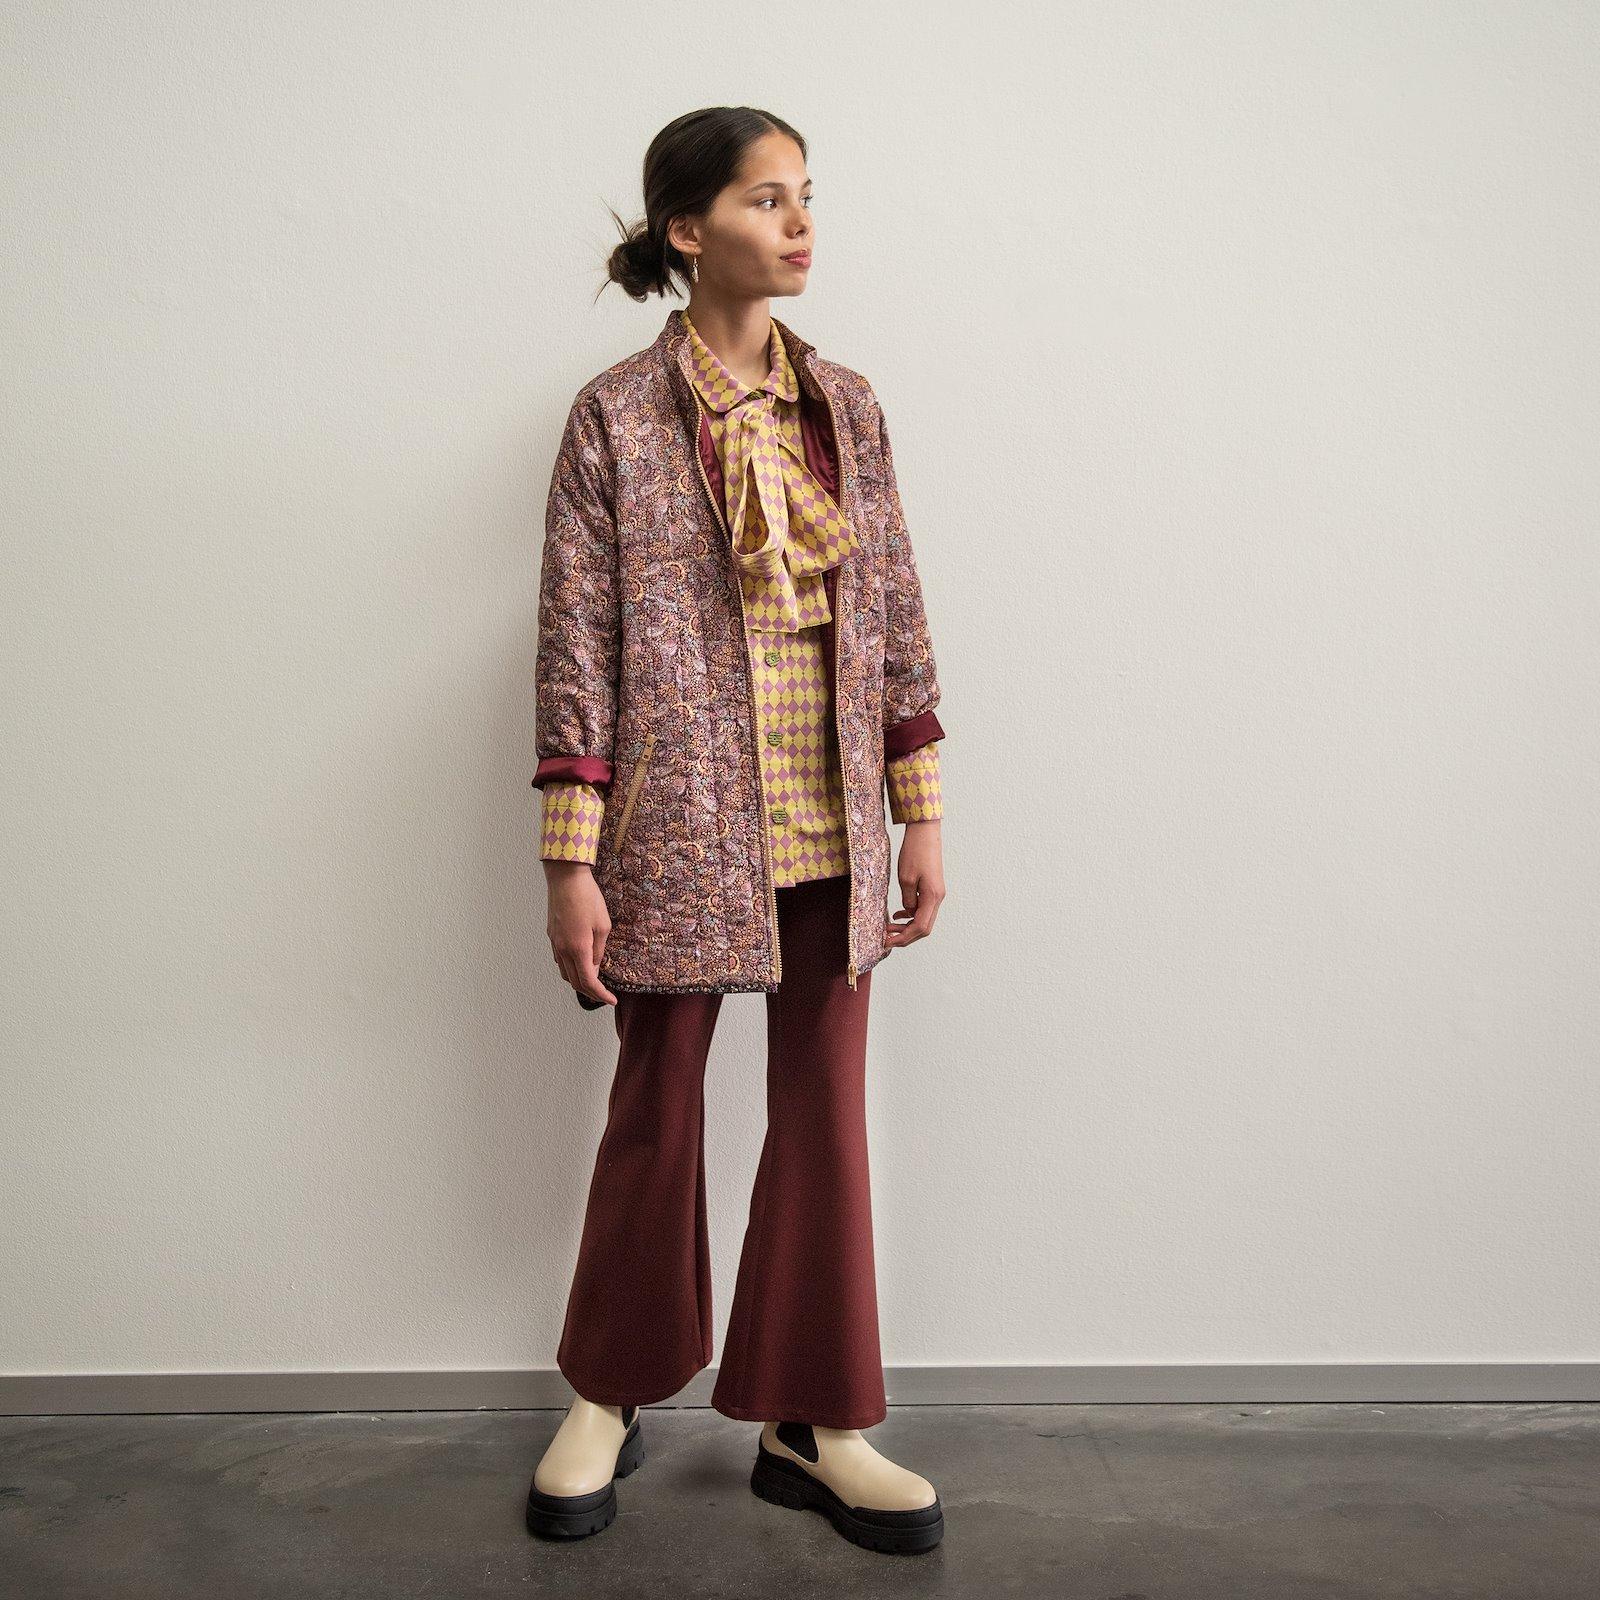 Cotton chestnut brown paisley pattern p64019_852409_22344_9901_7014_DIY1018_852414_852413_852410_p60038_420419_sskit